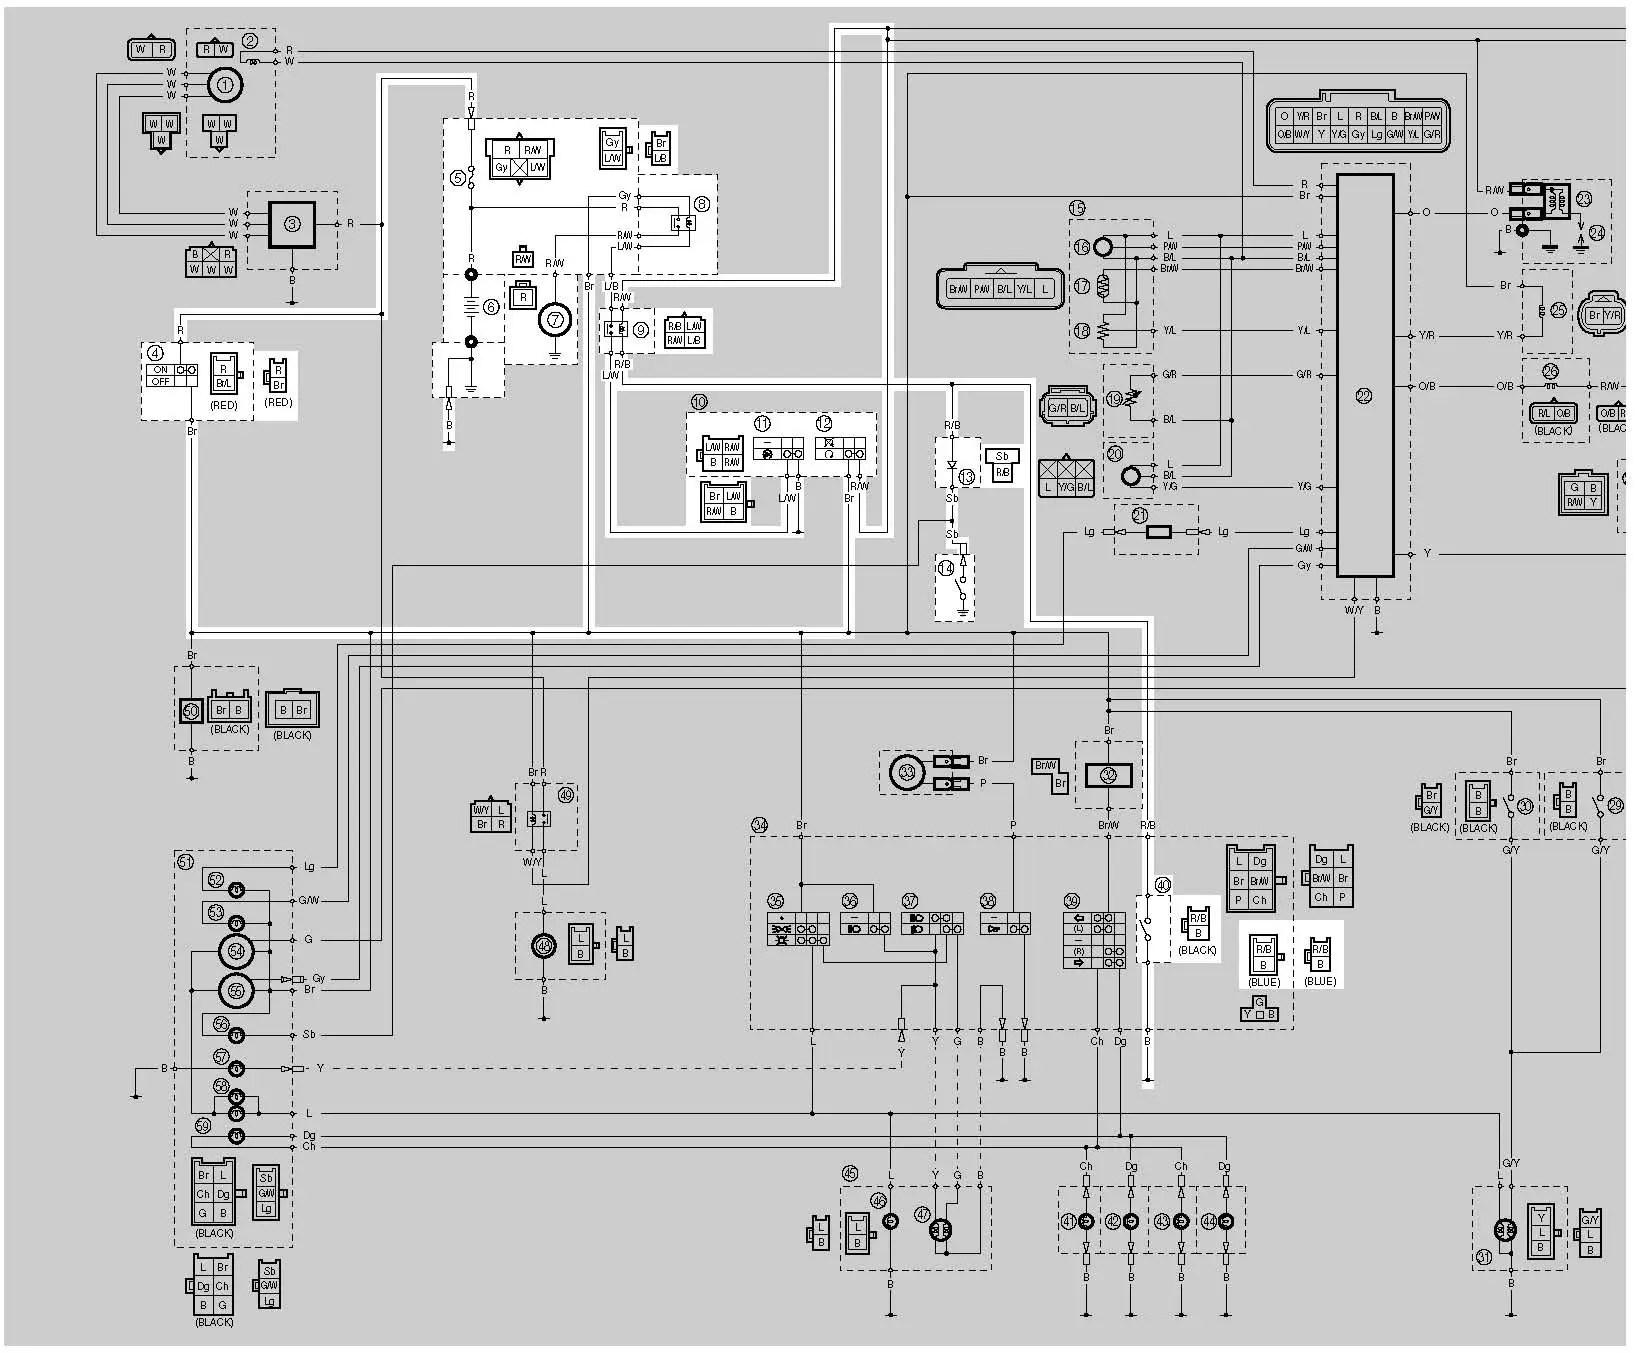 hight resolution of yamaha moto 4 350 cdi wire diagram imageresizertool com yamaha r6 wire diagram yamaha atv wire